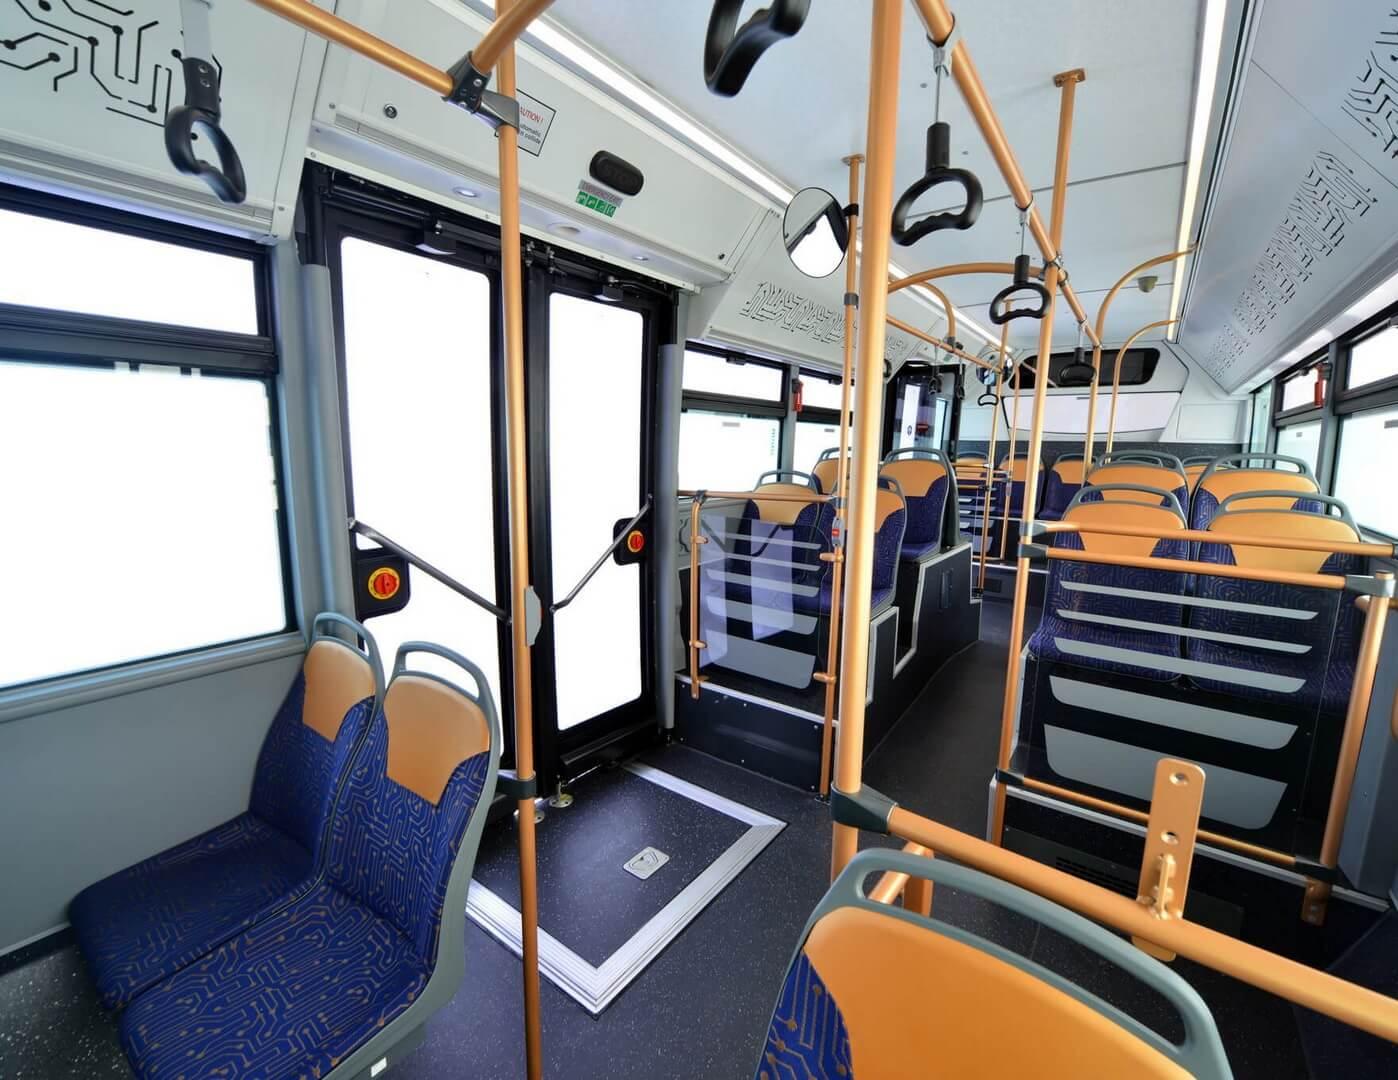 Салон электрического автобуса Avenue Electron